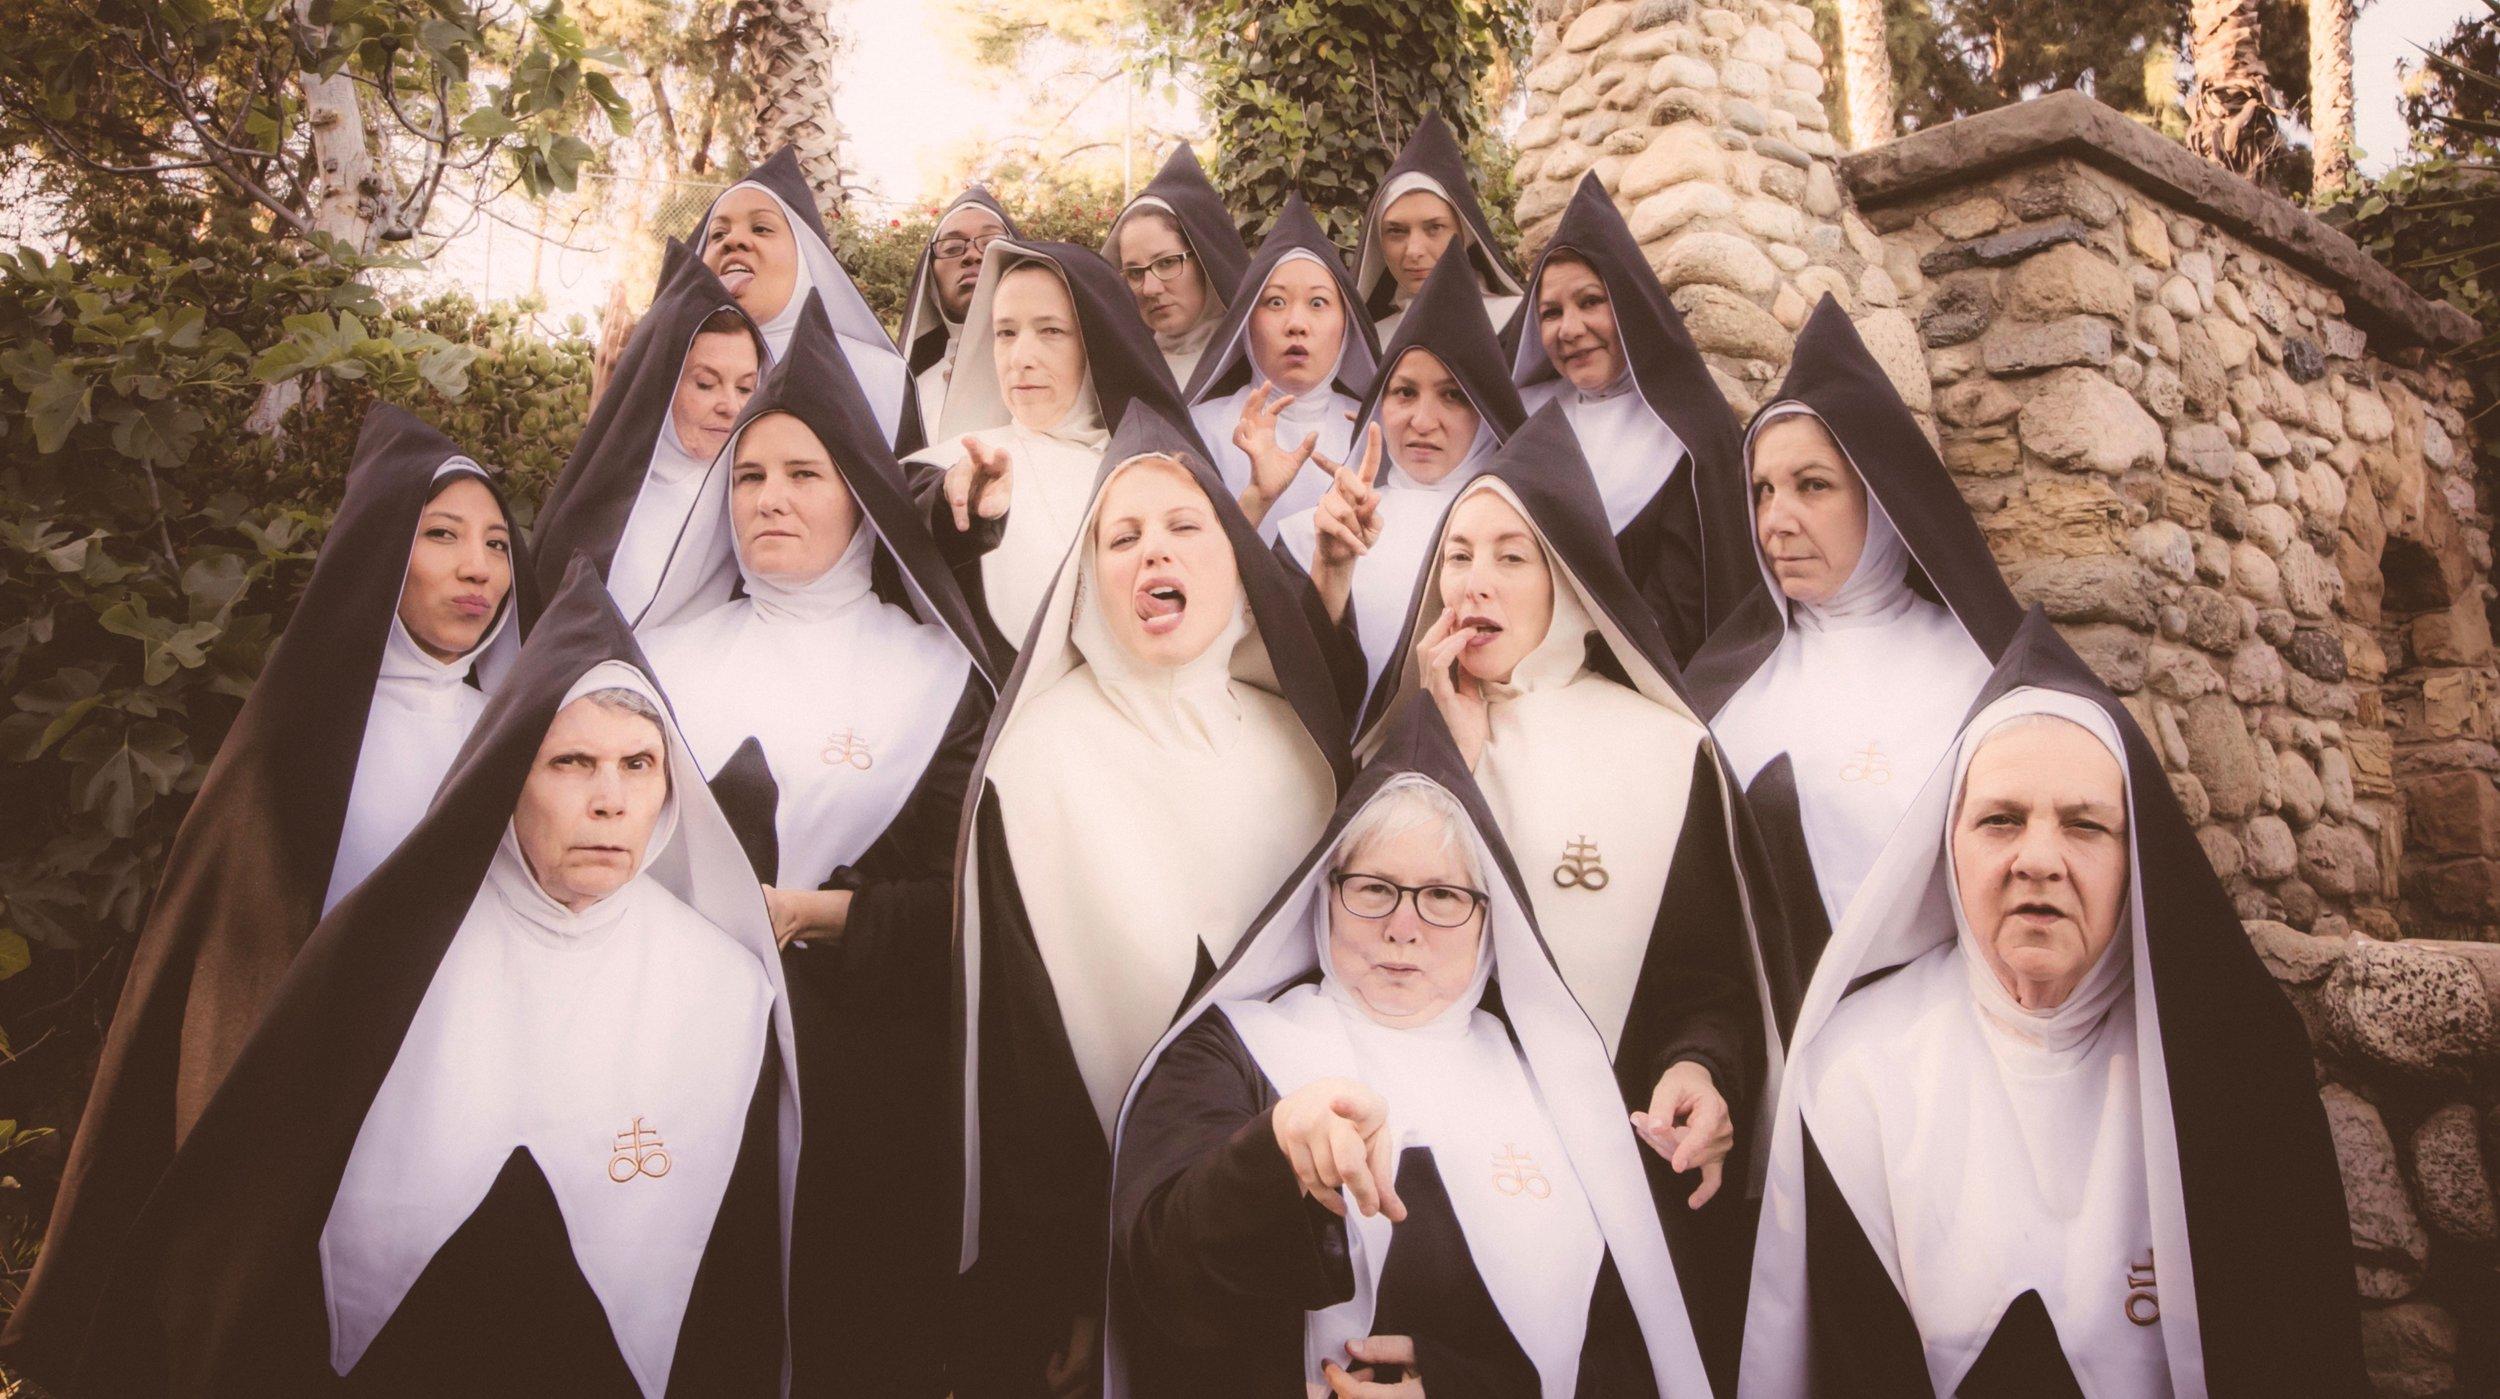 8 Good omens chattering nuns hal kirkland.jpeg